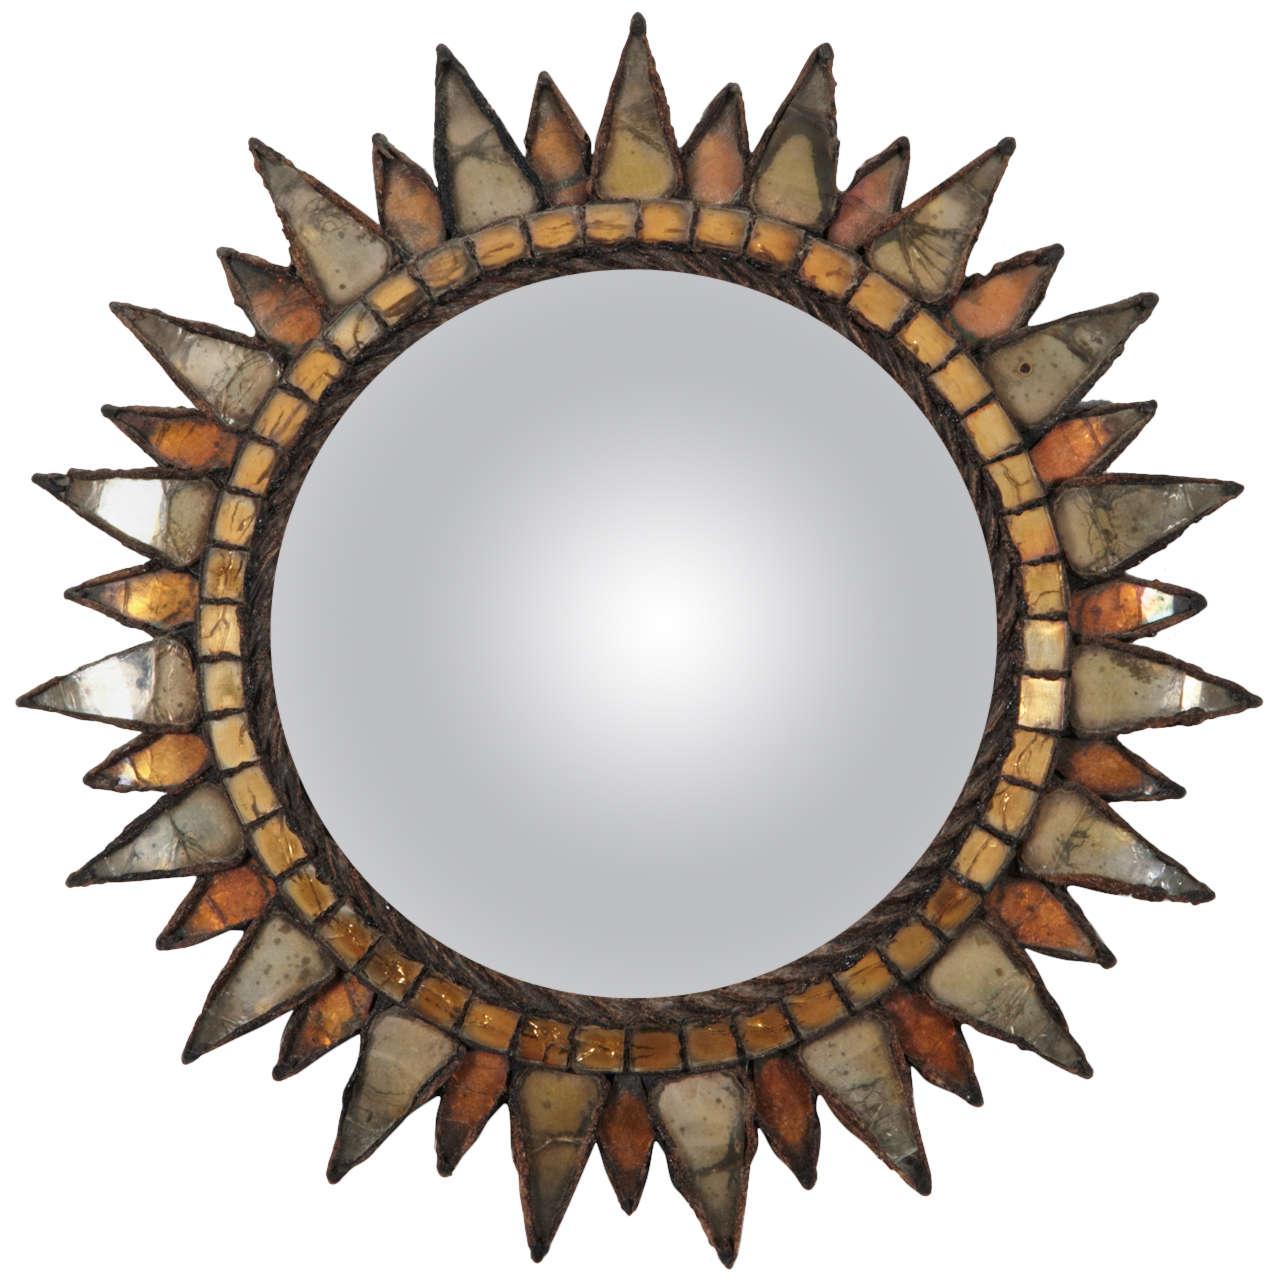 Line vautrin sun mirror no 3 soleil pointes n 3 for for Miroir line vautrin